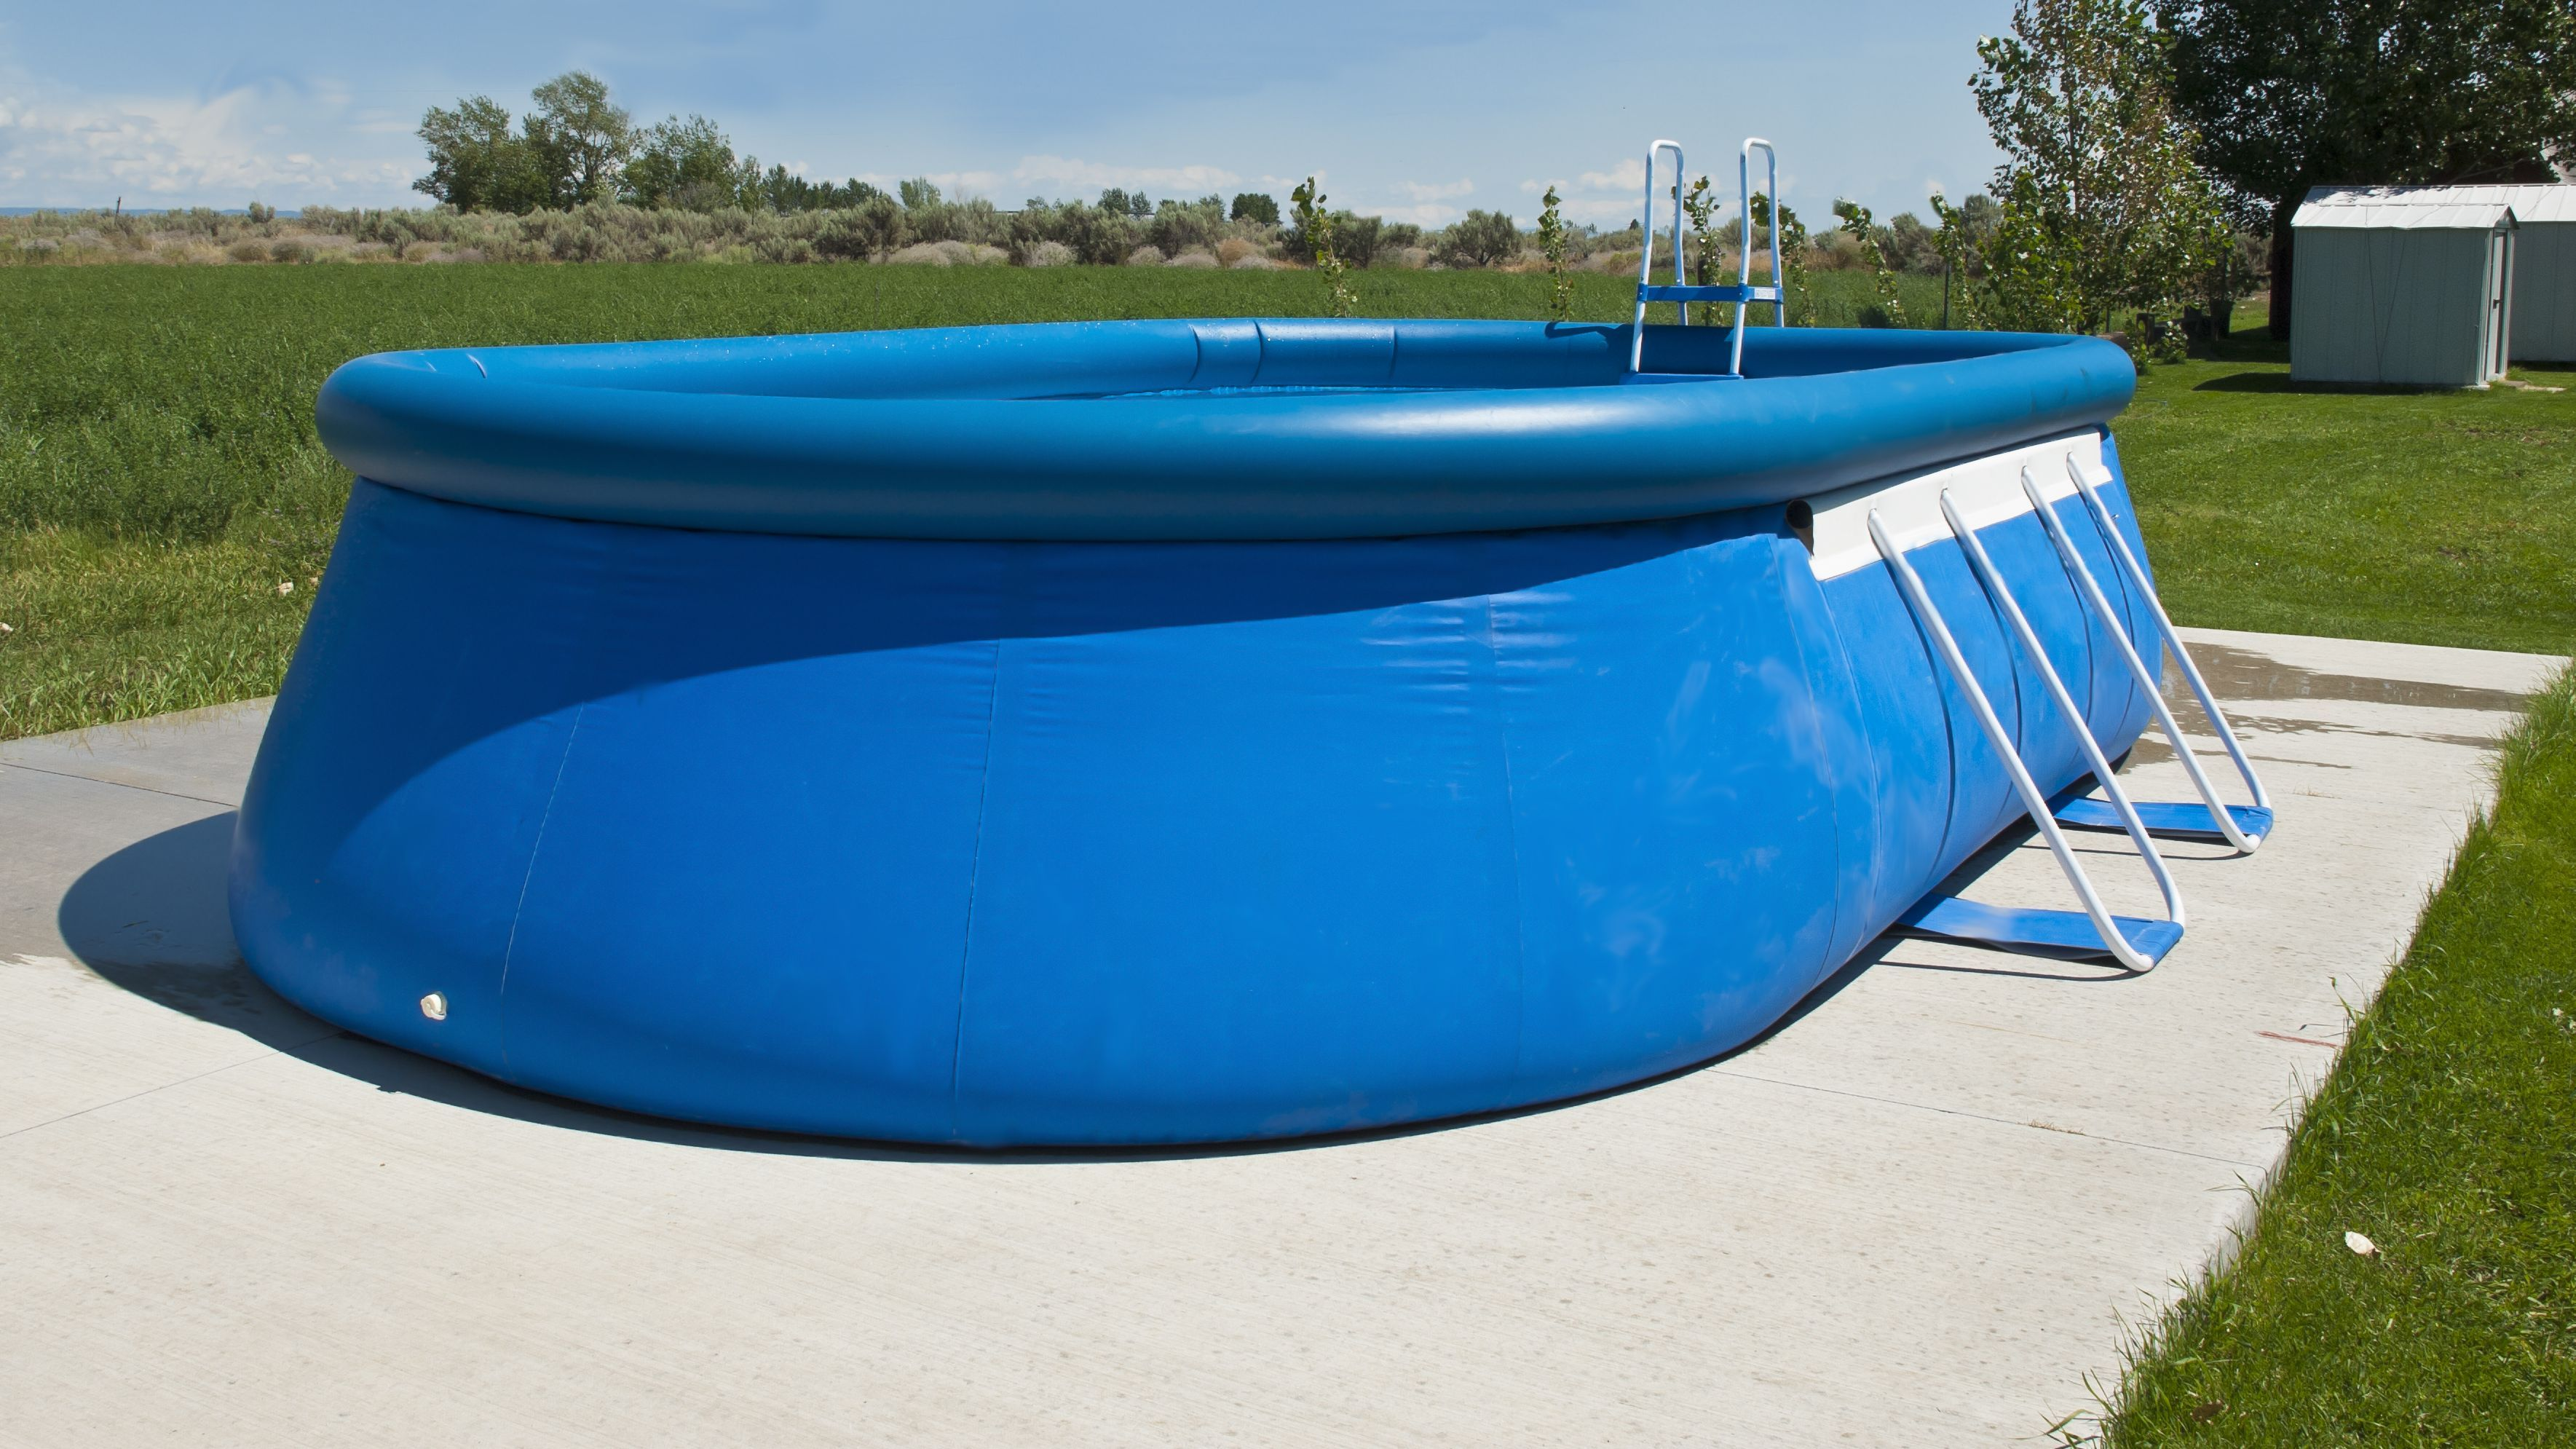 Come installare una piscina autoportante